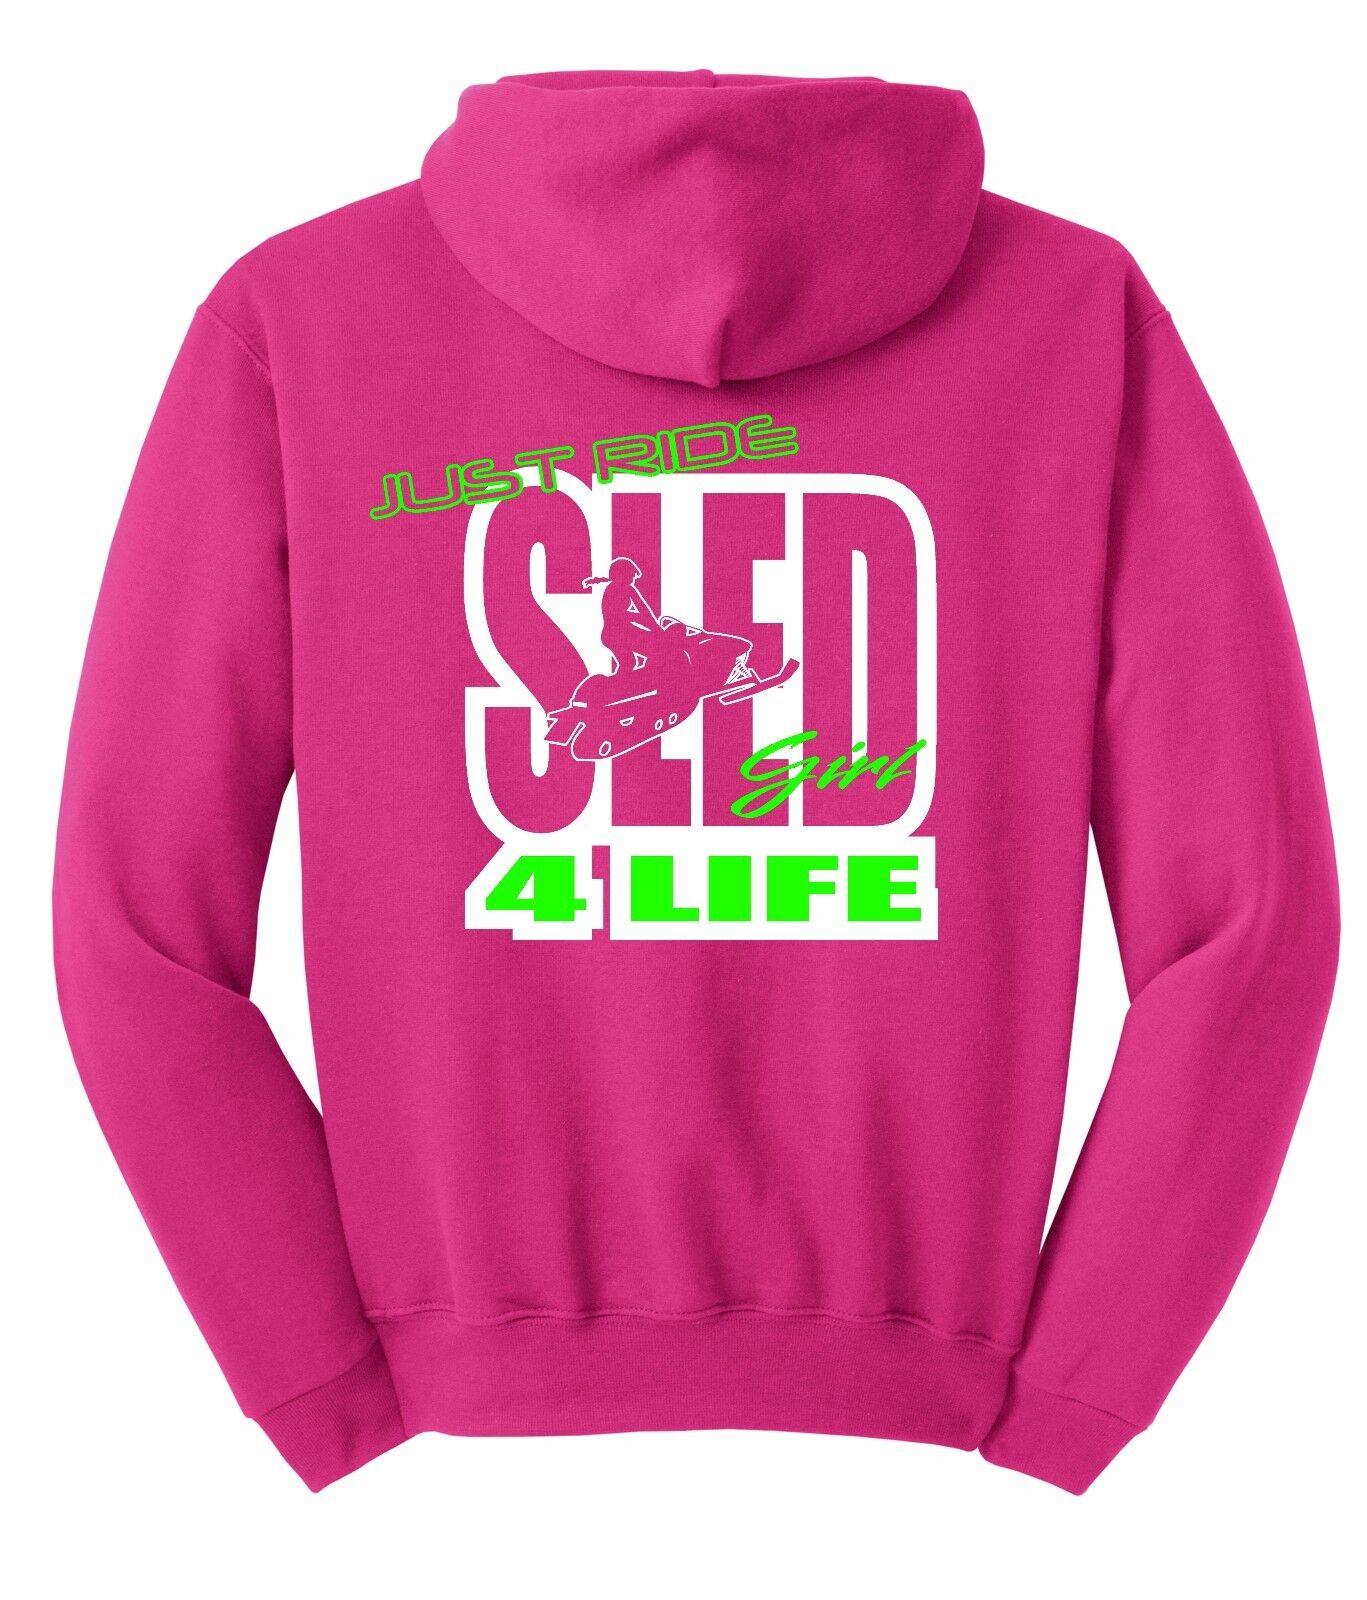 JUST RIDE SLED GIRL 4 LIFE HOODIE SHIRT SNOW MOBILE SKI DOO ARCTIC CAT